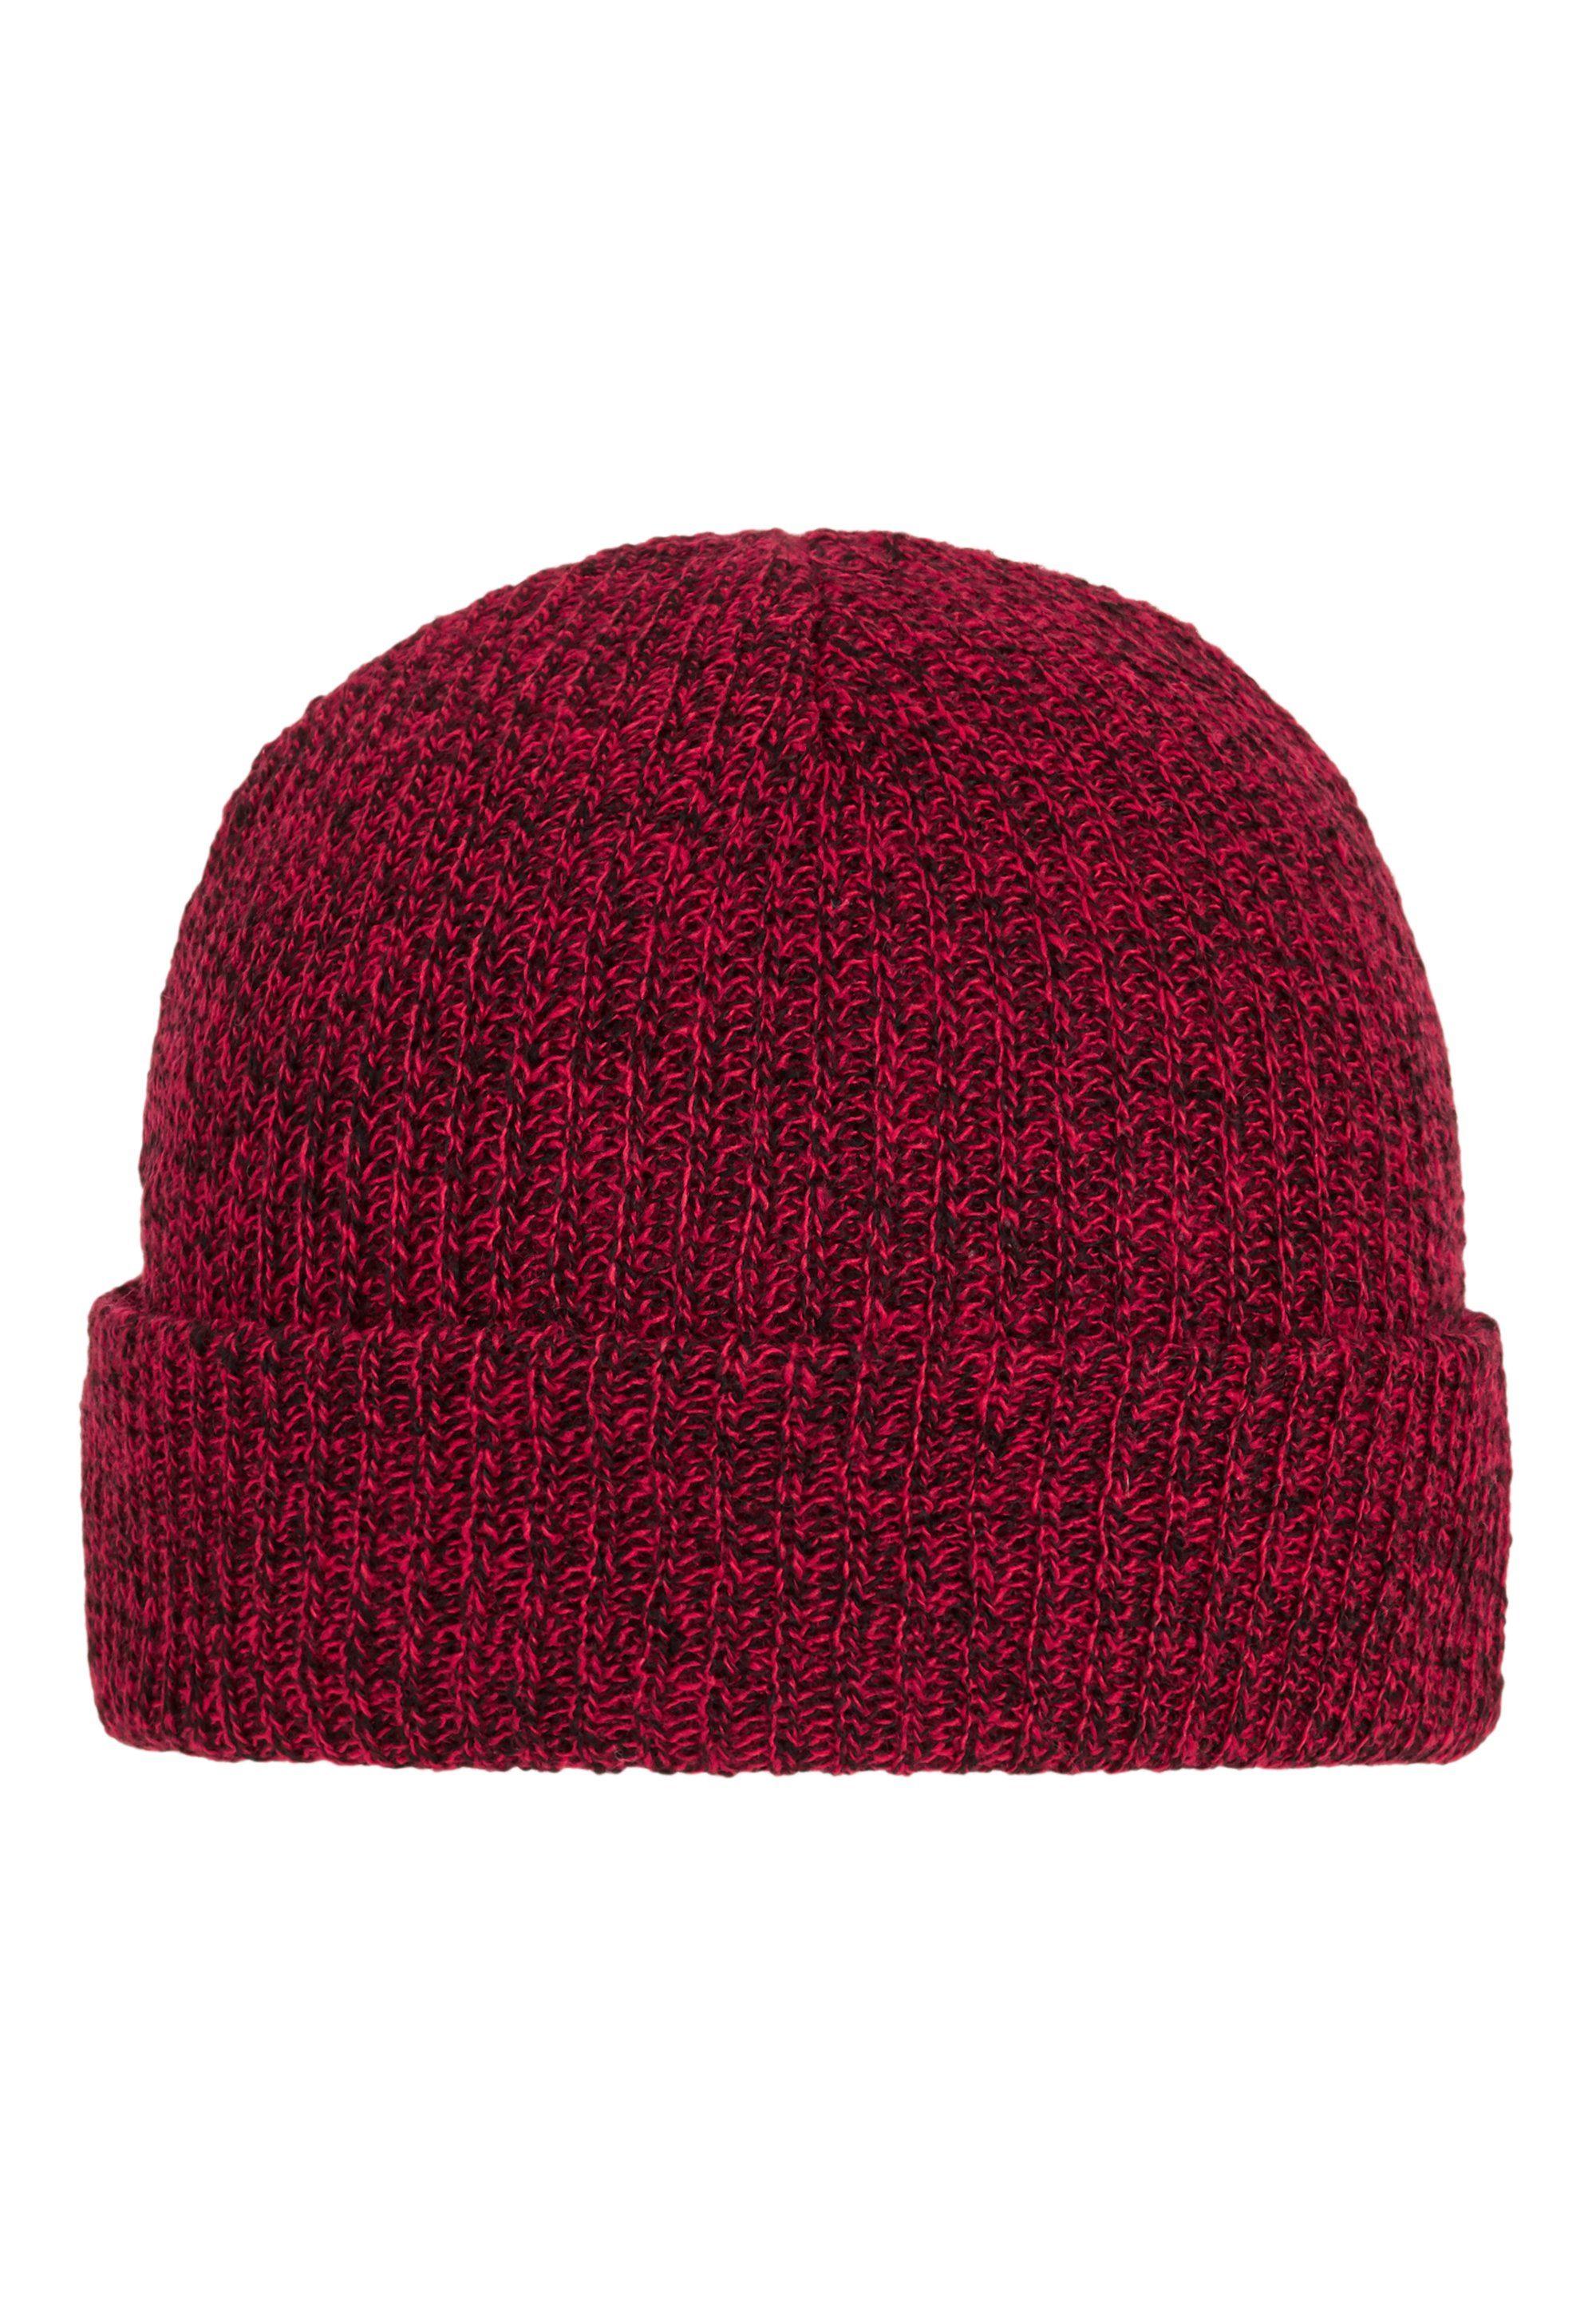 Neff Headwear Strickmütze